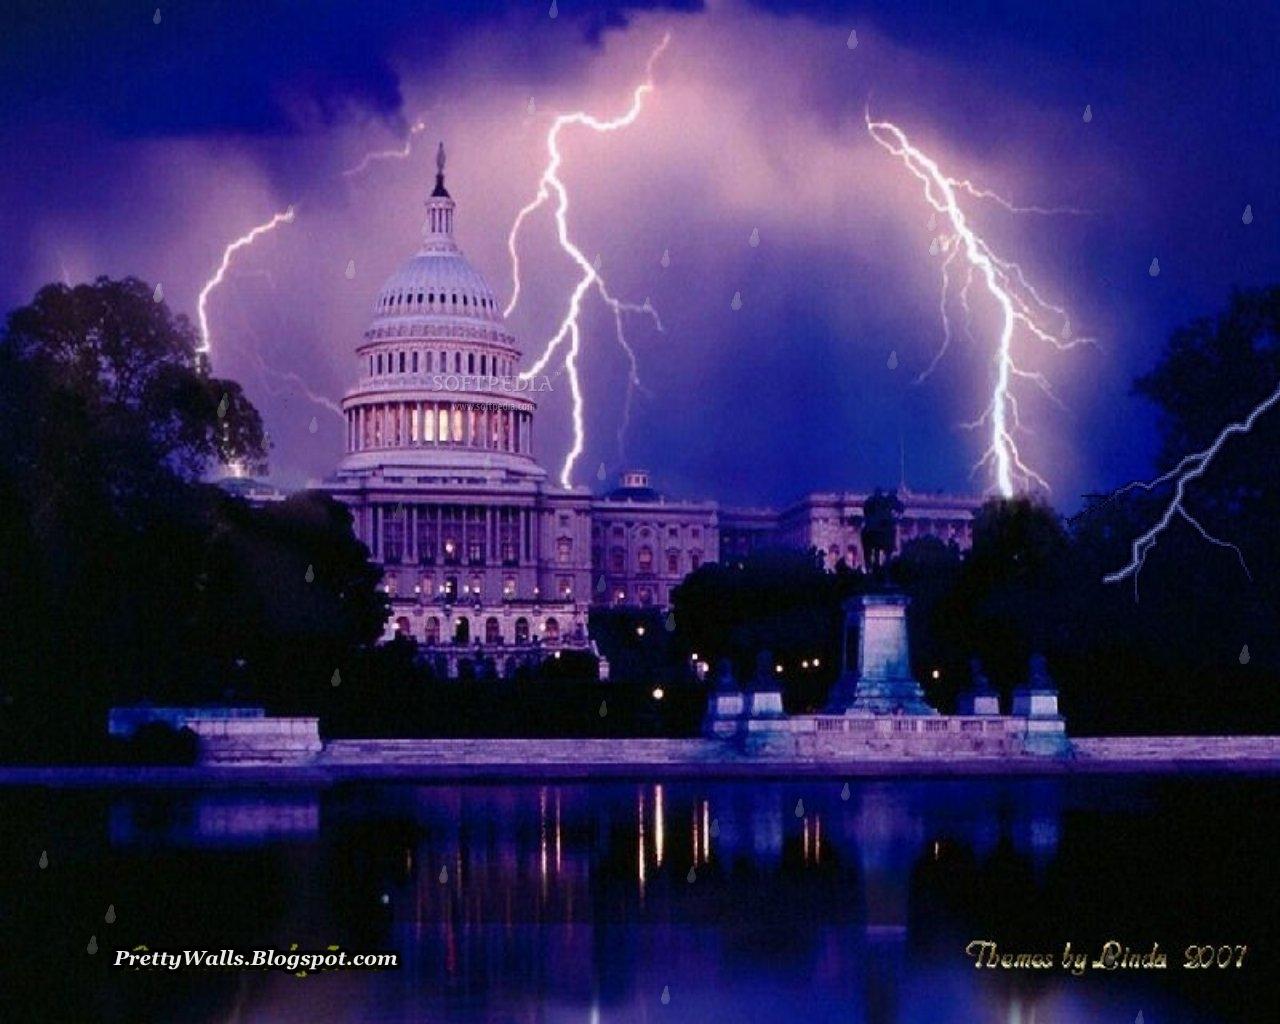 walls download beautiful storm hd wallpapers pictures wallpaper 1280x1024